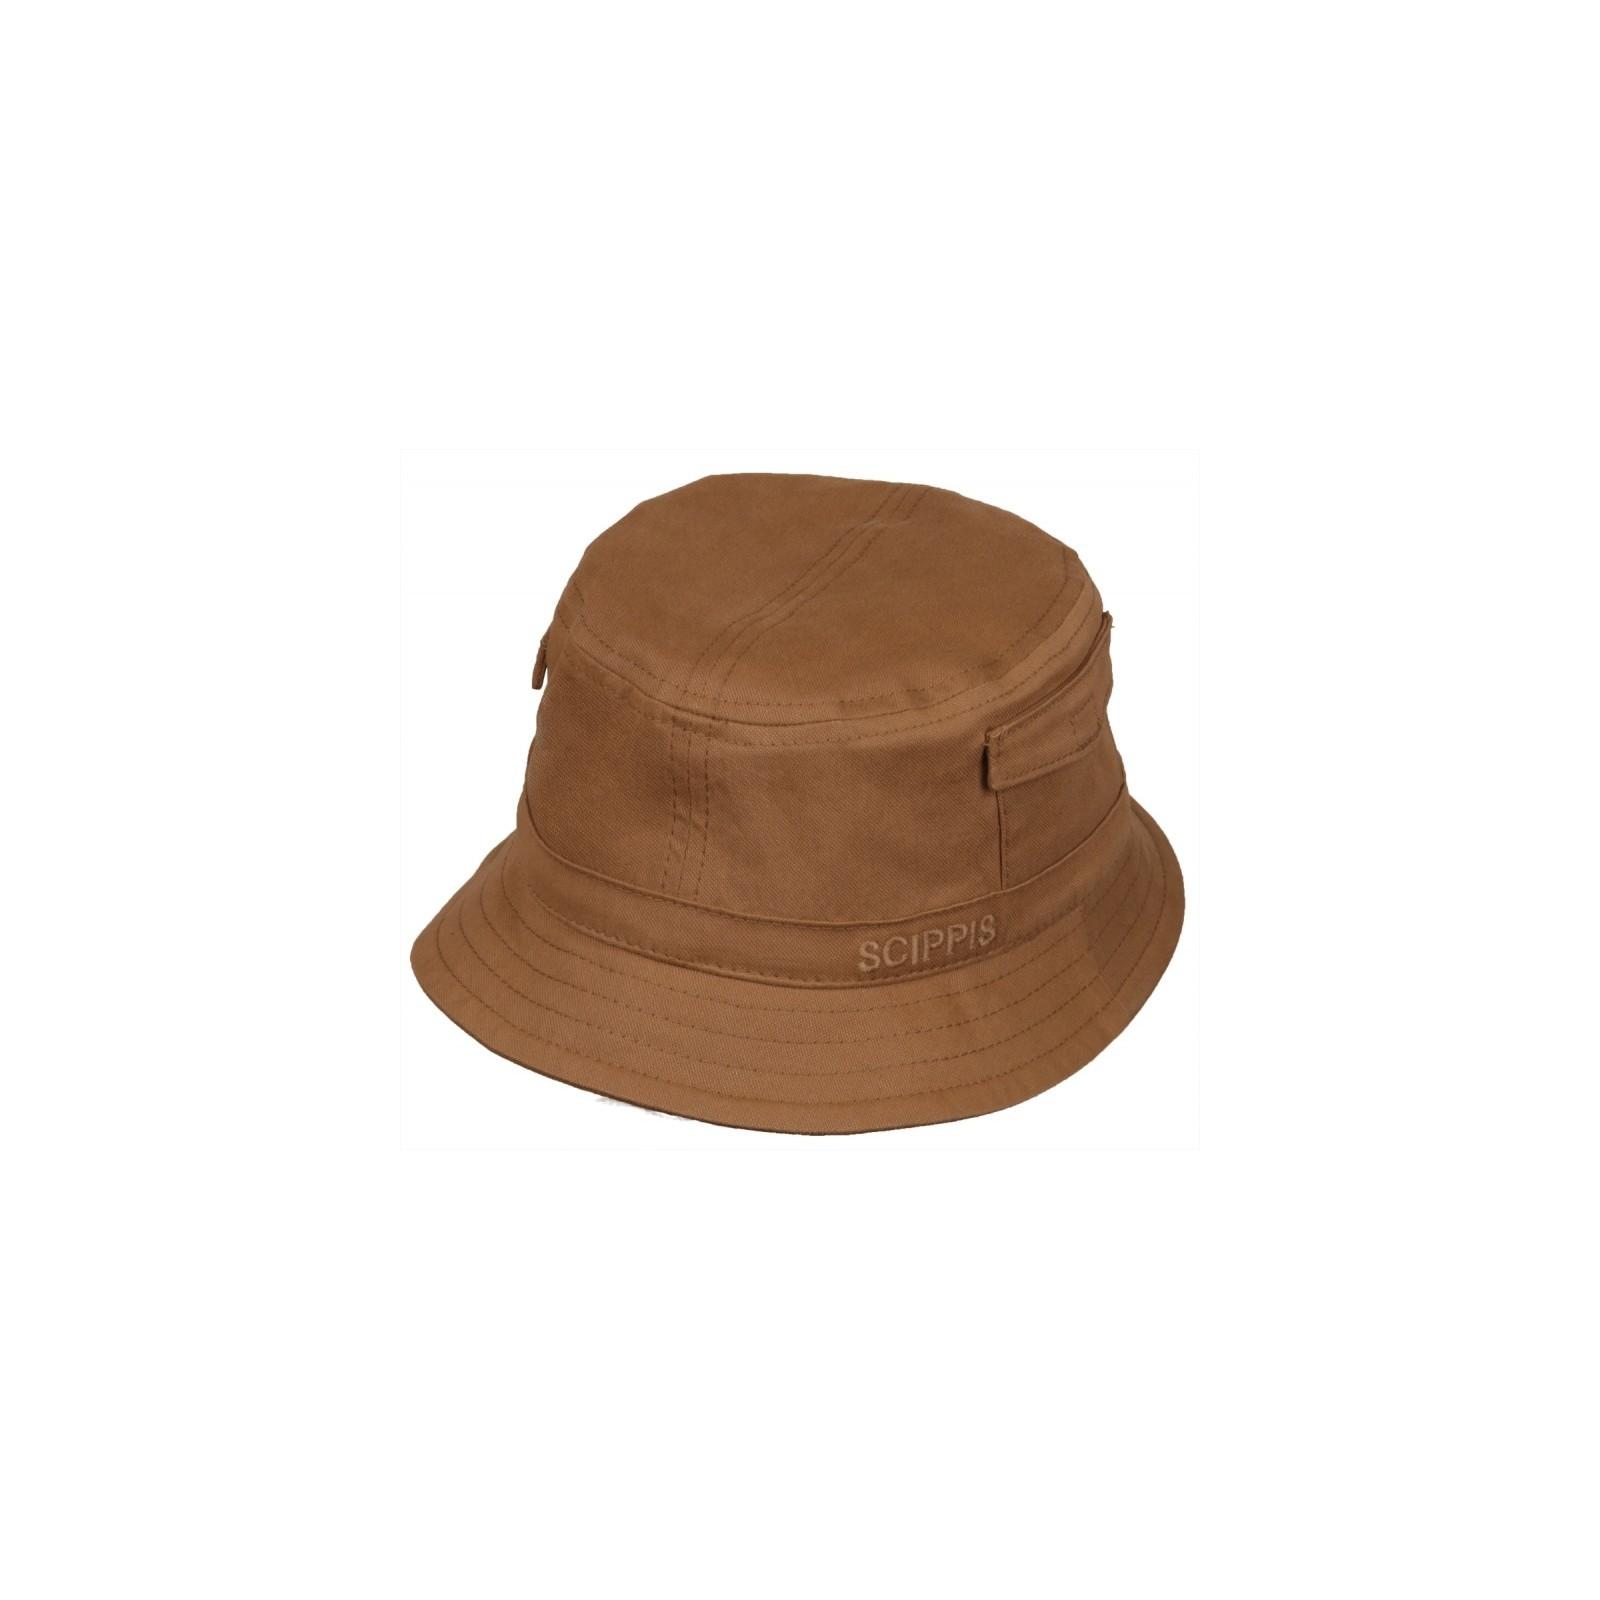 Scippis Fisherman hat